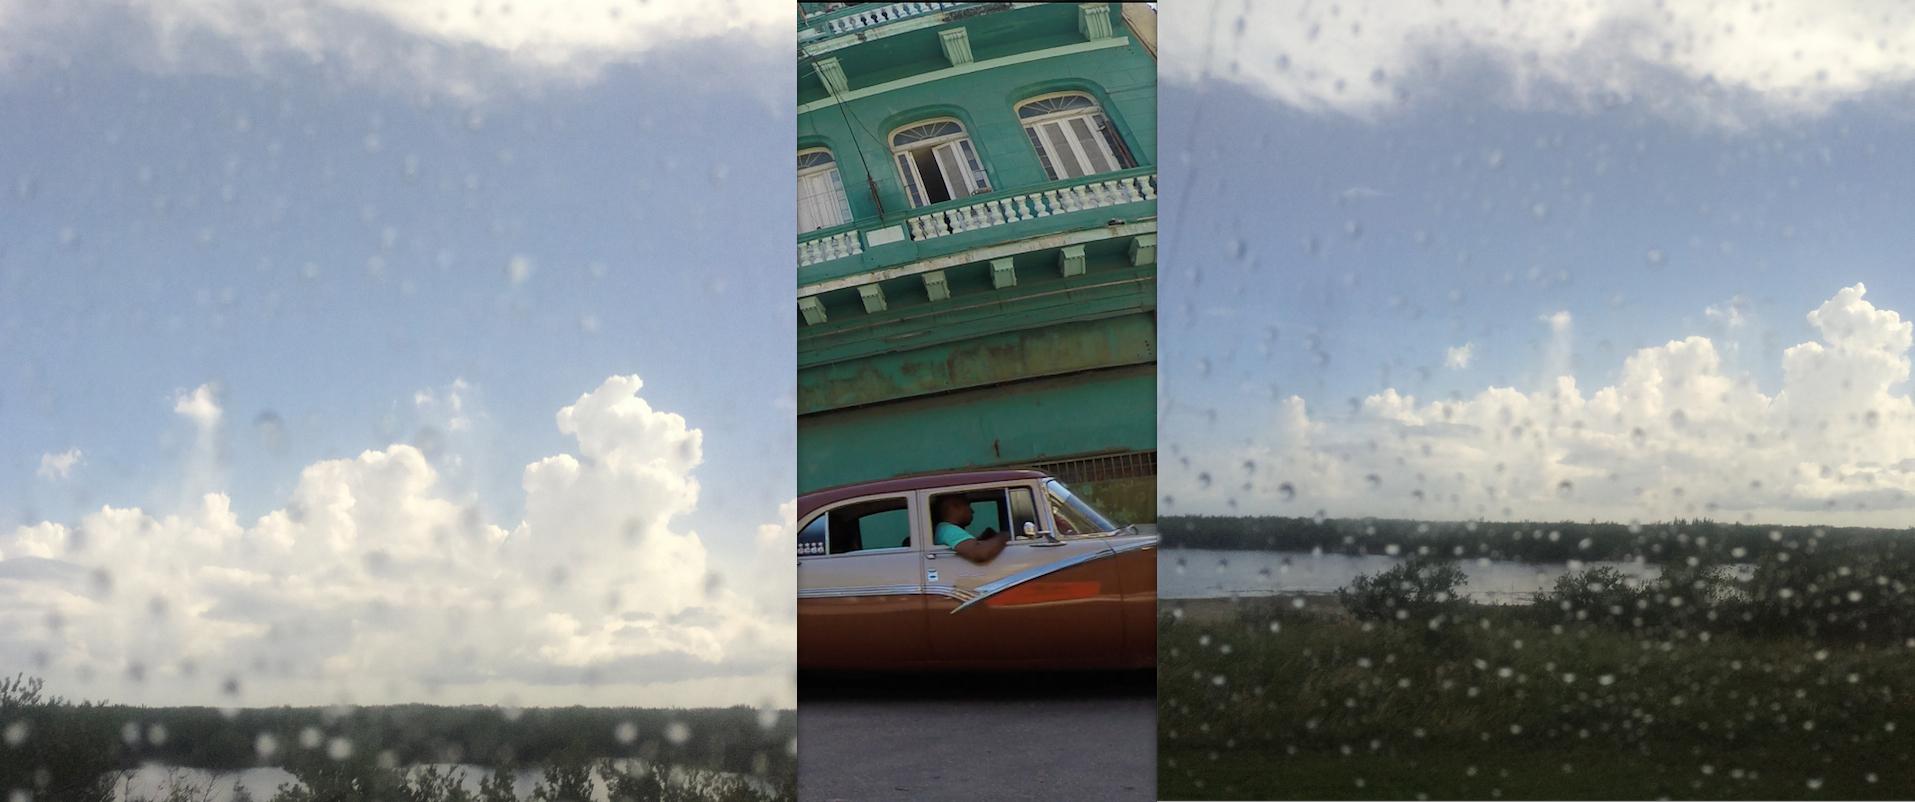 Havana-TrinidadMay 2015_5  Digital assembly;  Copyright © Tennyson Woodbridge, 1963 to present